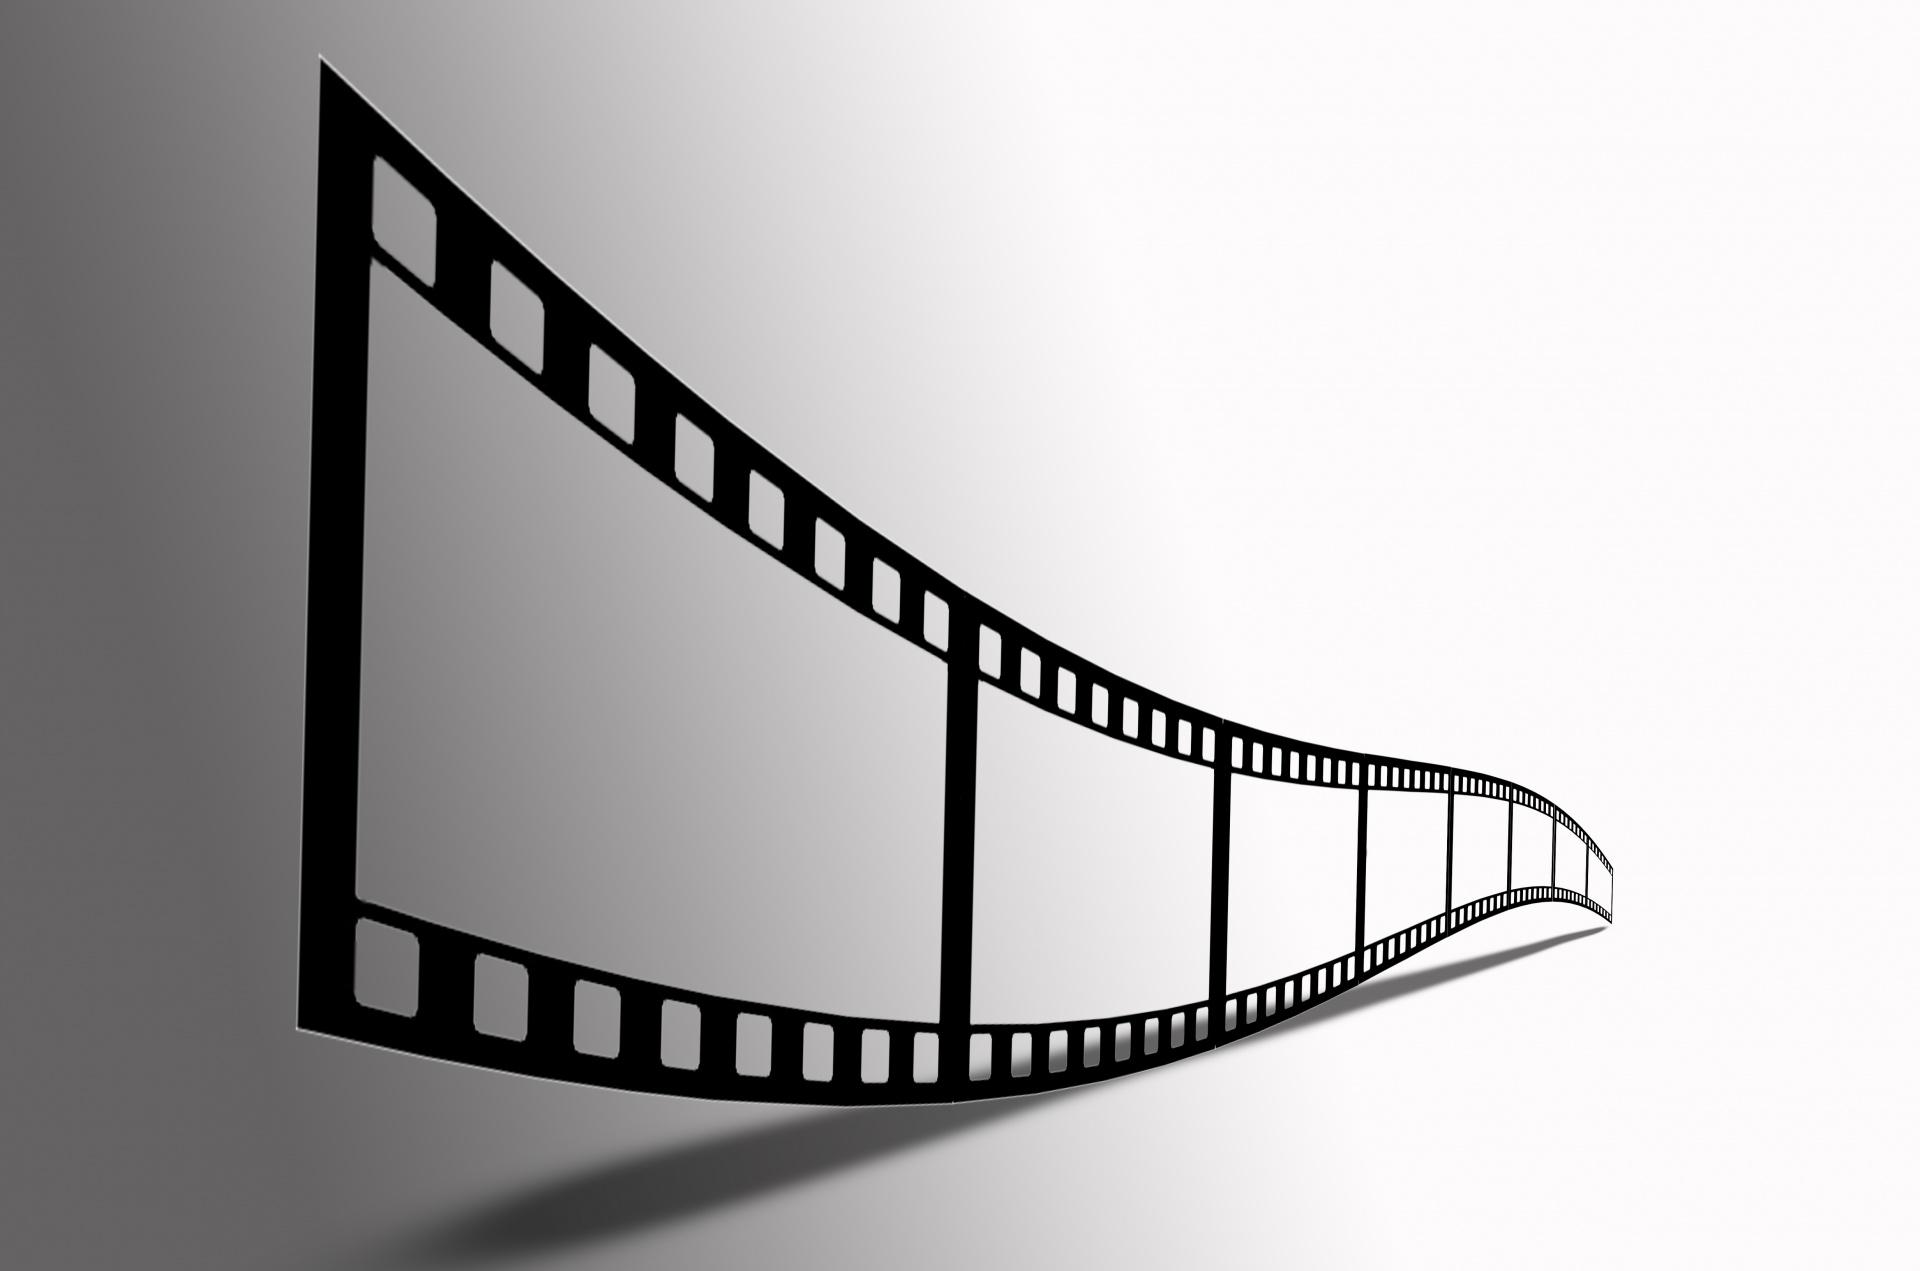 film-strip-1461657718ip6